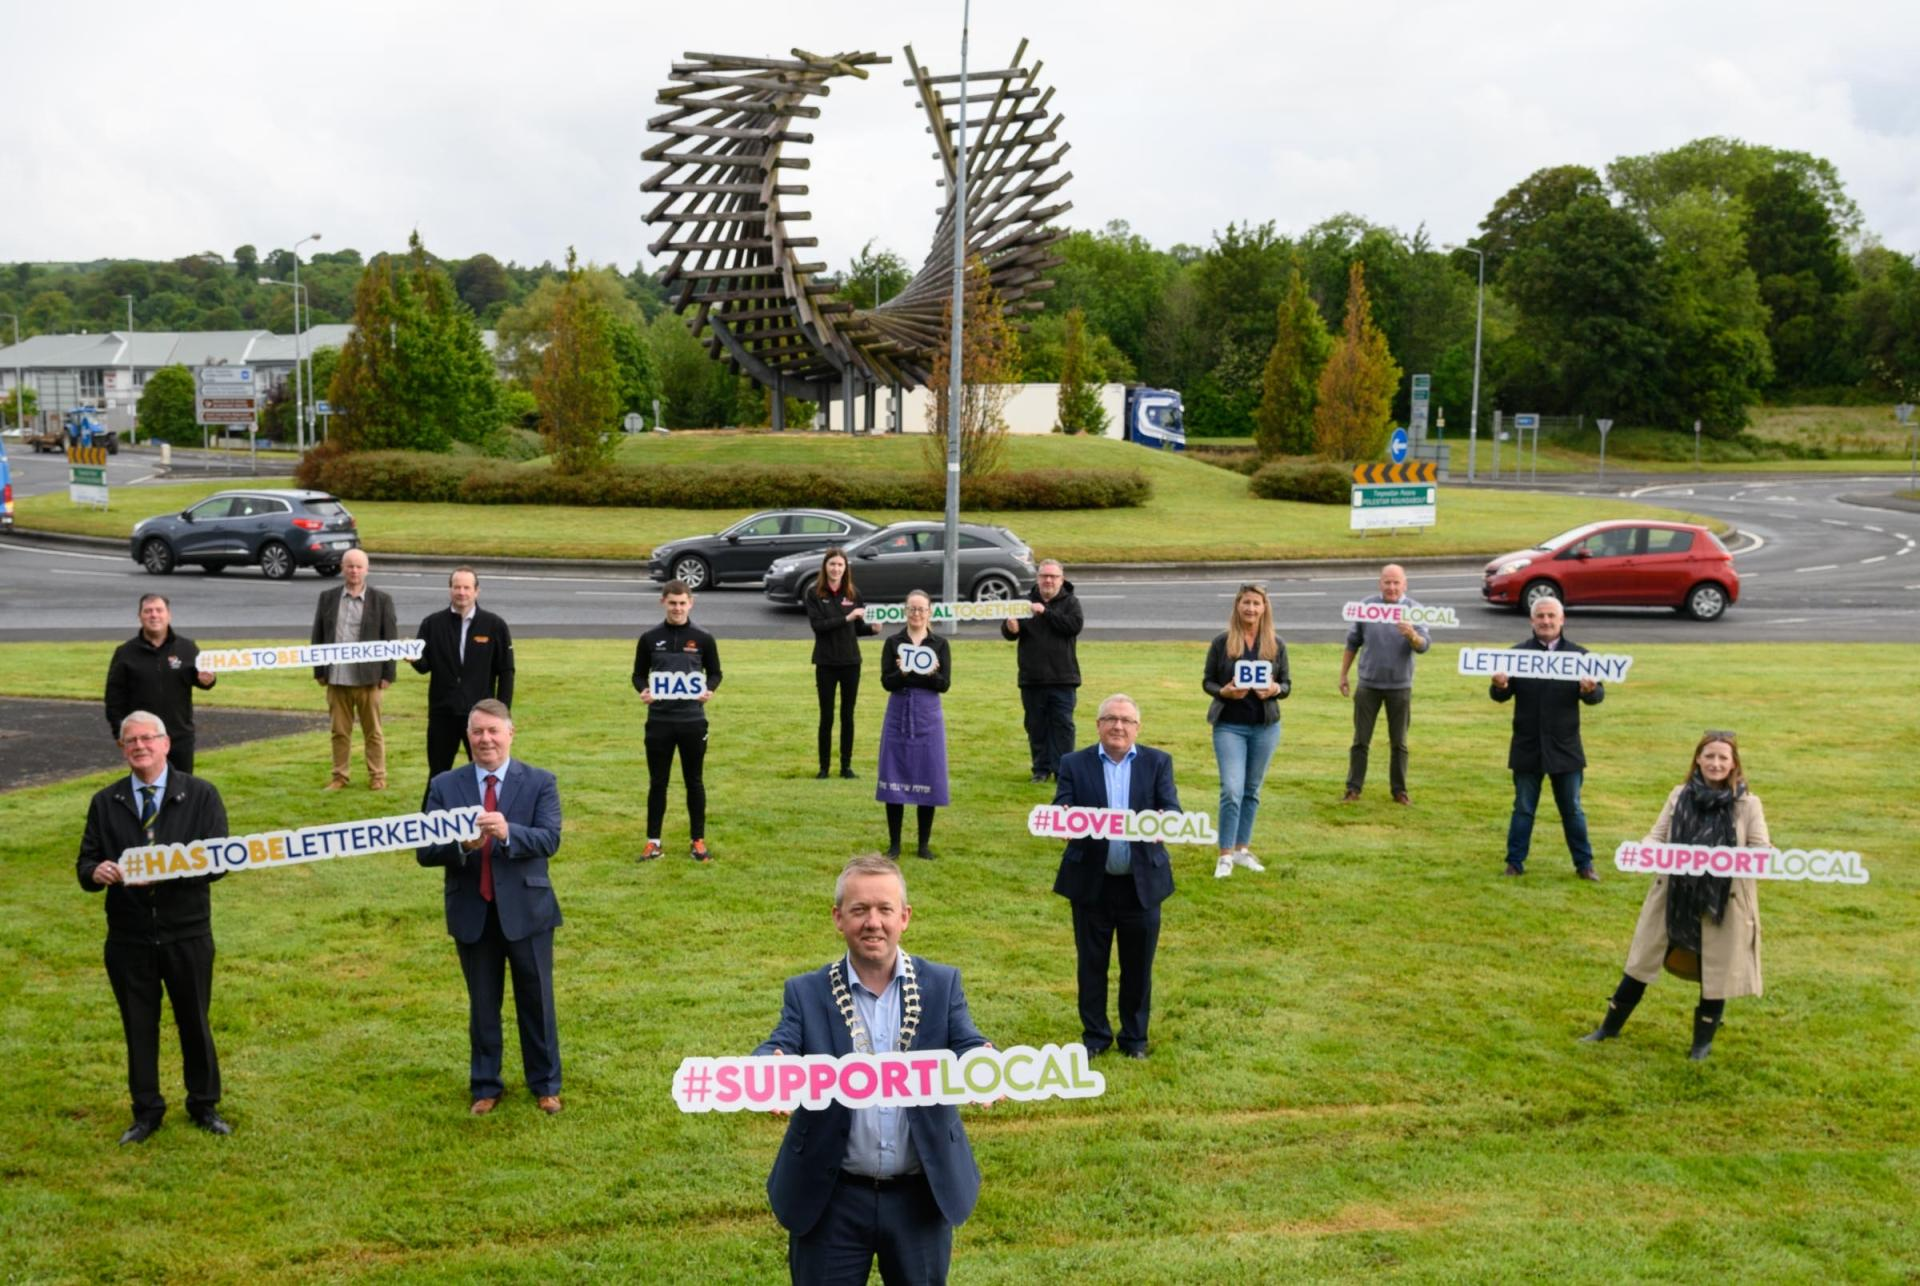 Date announced for 2020 Donegal Half Marathon in Letterkenny